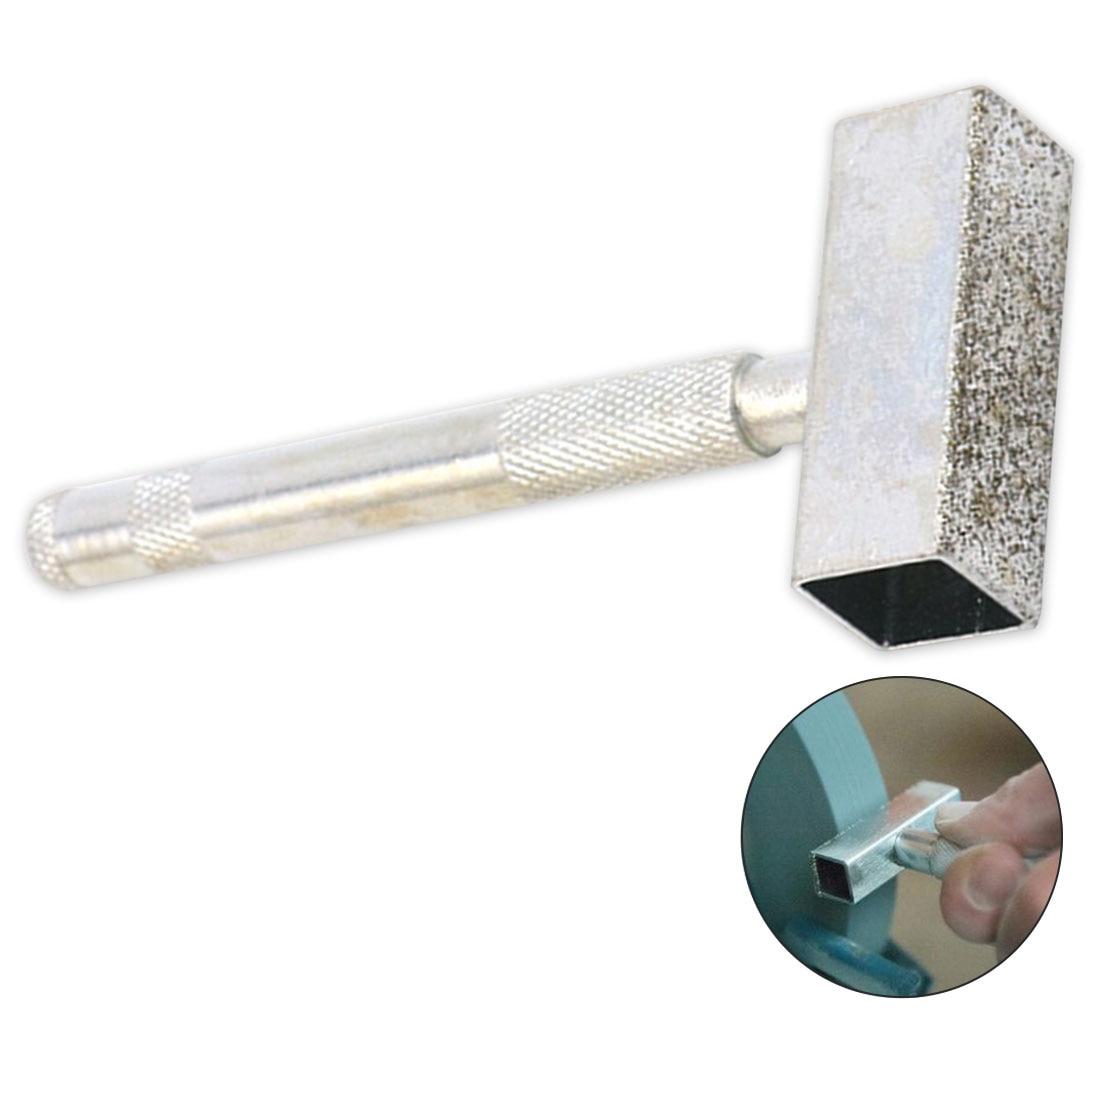 Hand Held Electroplated Diamond Dresser Diamond Grinding Disc Wheel Stone Dresser Tool Dressing Bench Grinder Grinding Tool